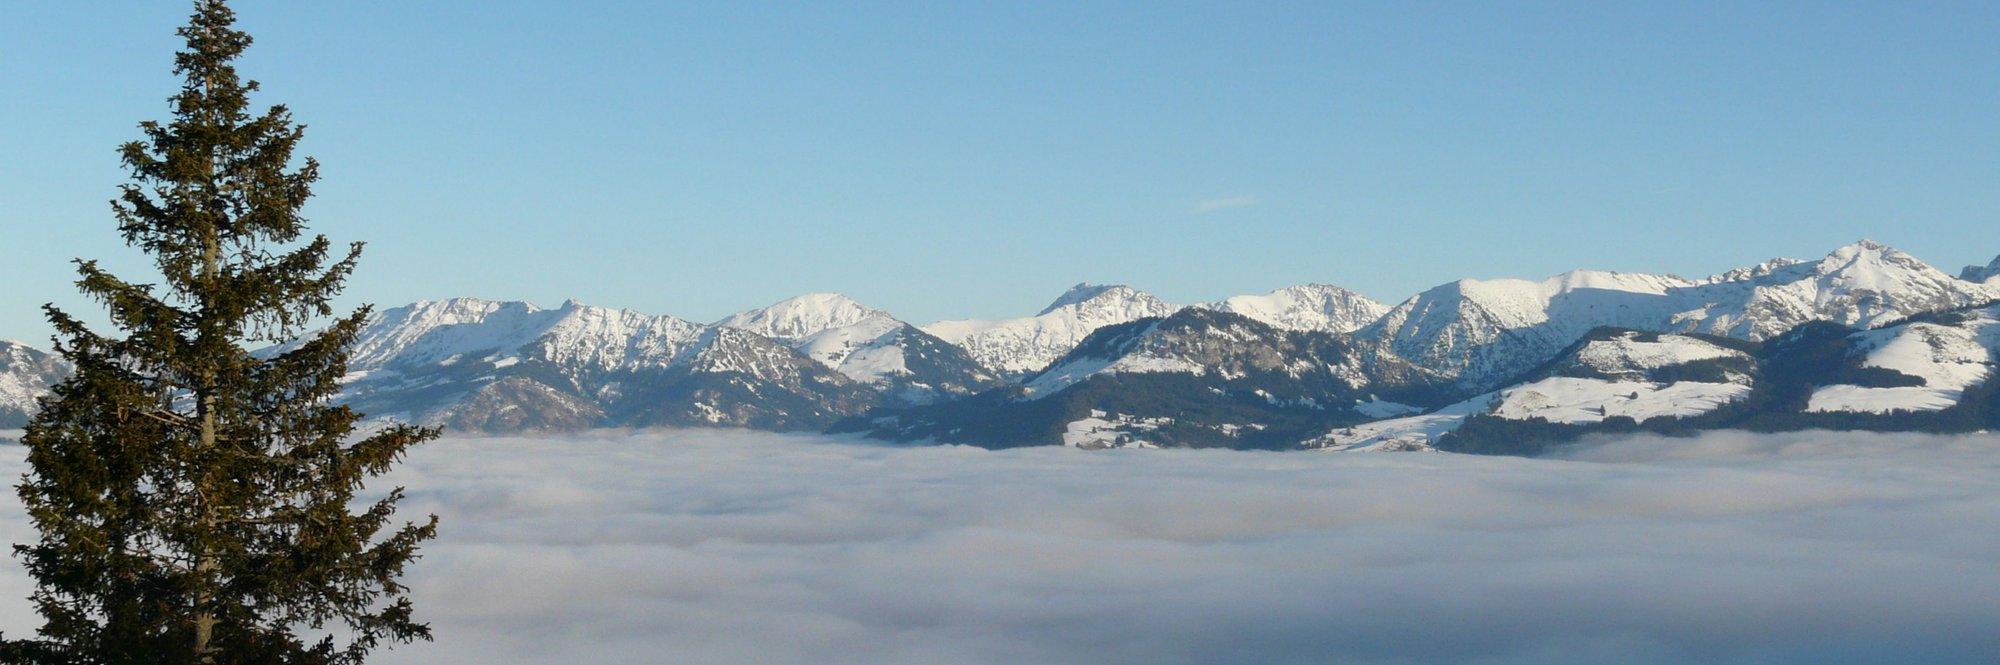 Schneeschuhwandern inm Allgäu